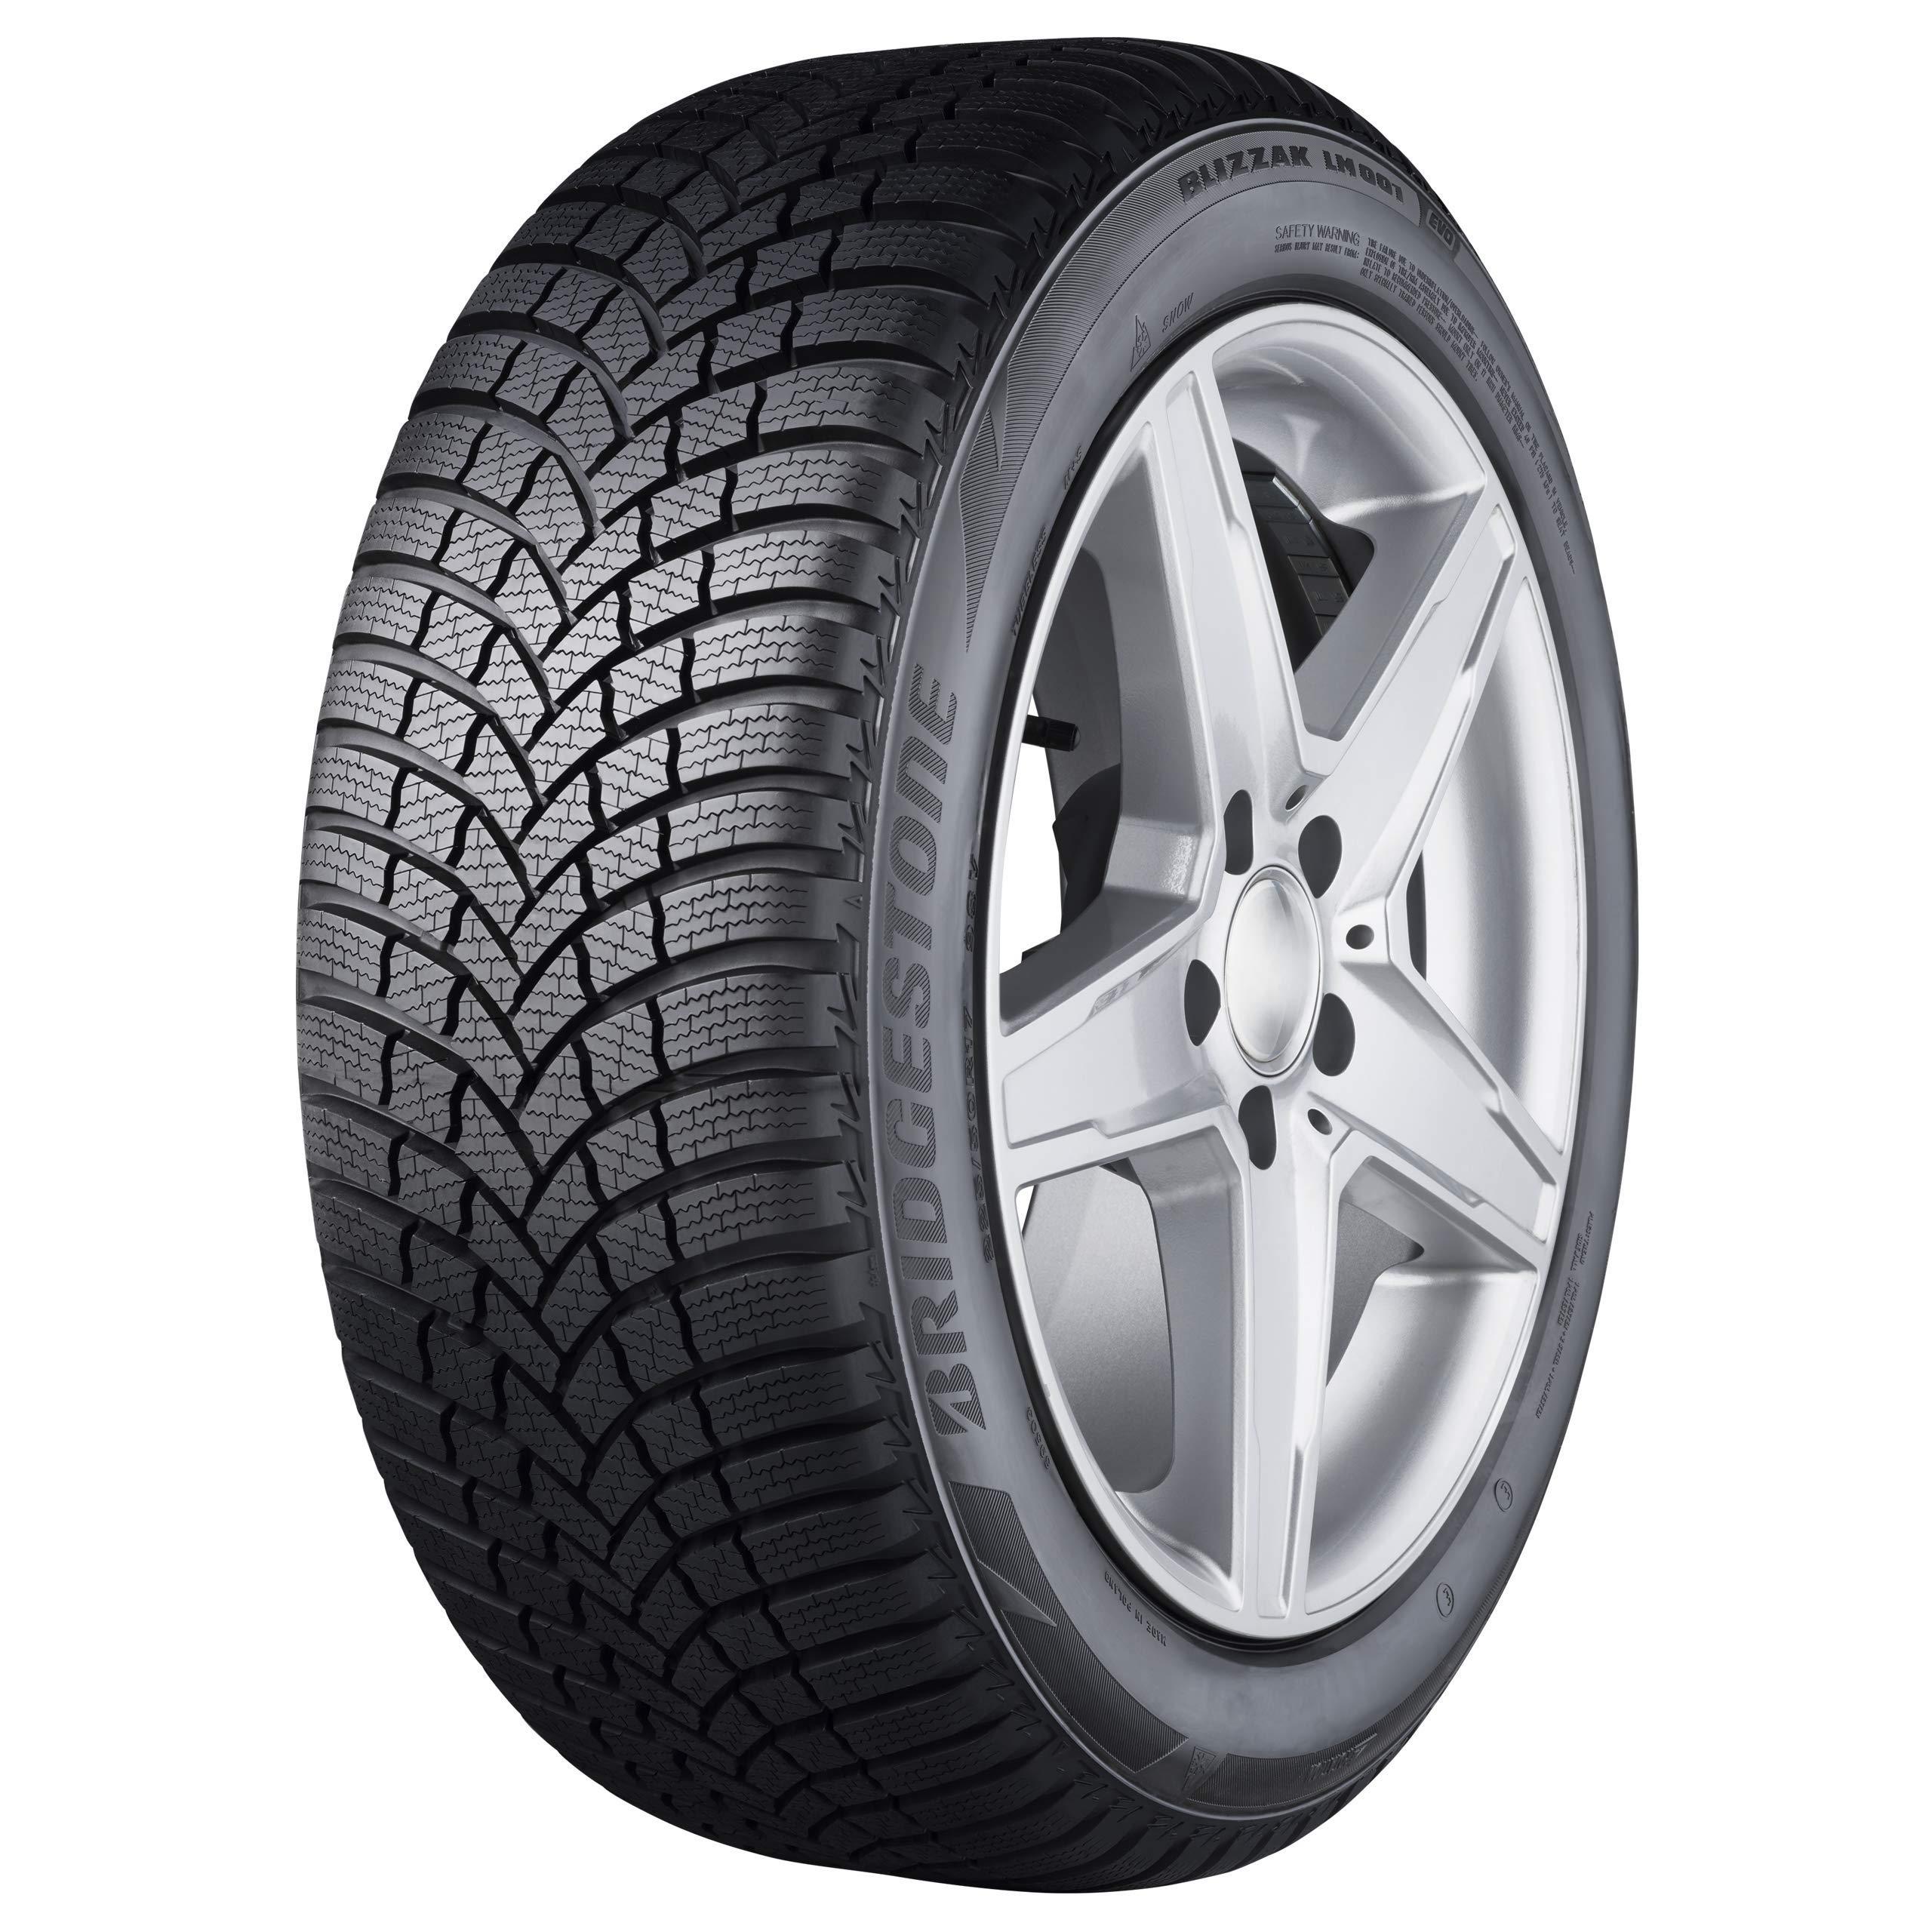 Bridgestone Blizzak LM-001 Evo M+S - 195/65R15 91T - Winter Tire